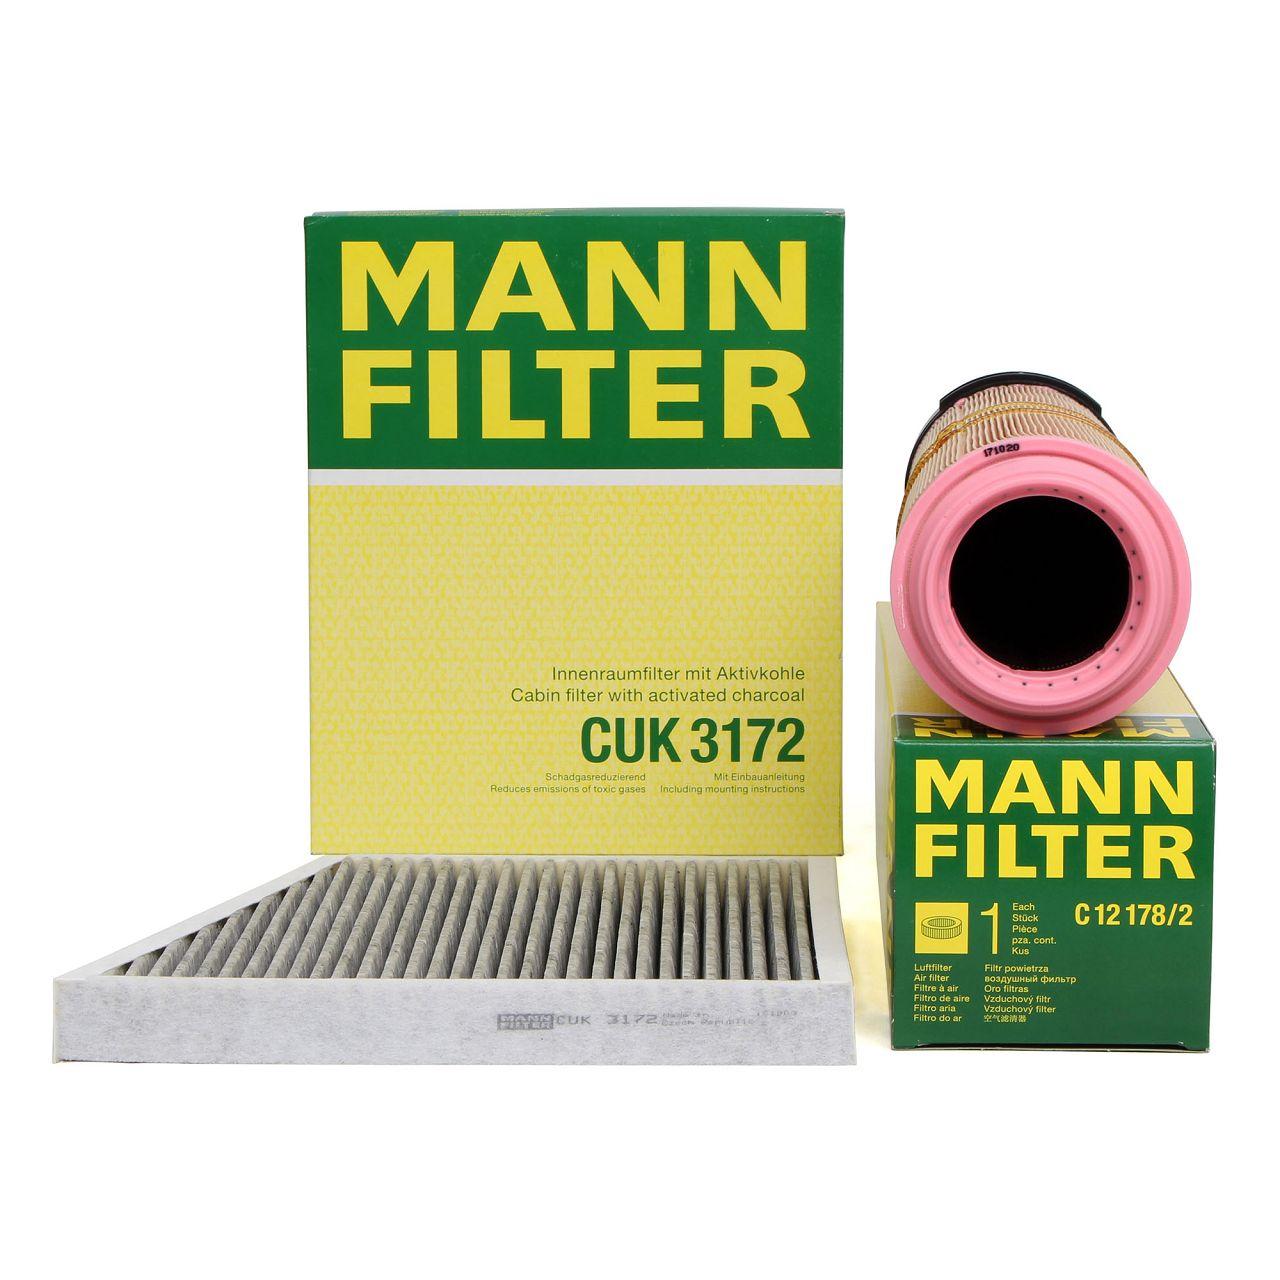 MANN Inspektionskit für MERCEDES E-KLASSE W211 S211 E200CDI E220CDI 136/170 PS